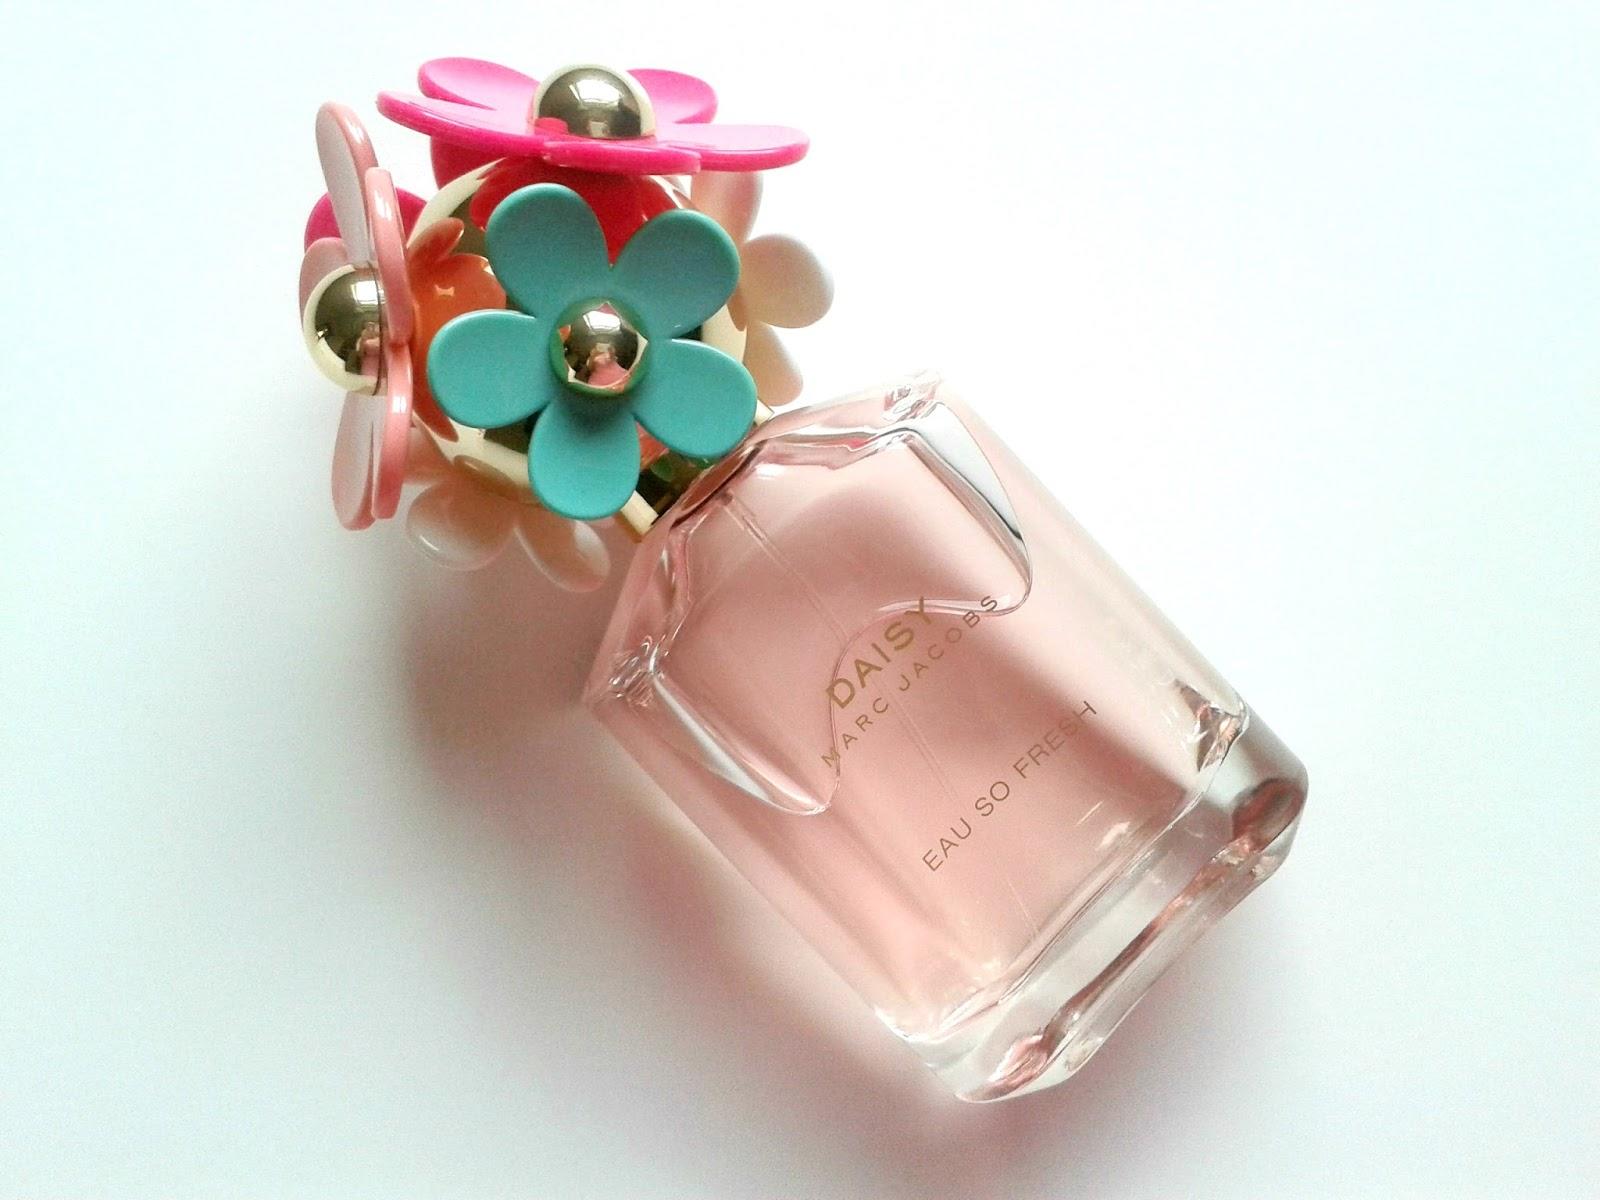 Marc Jacobs Daisy Eau So Fresh Delight EDT Beauty Review Bottle